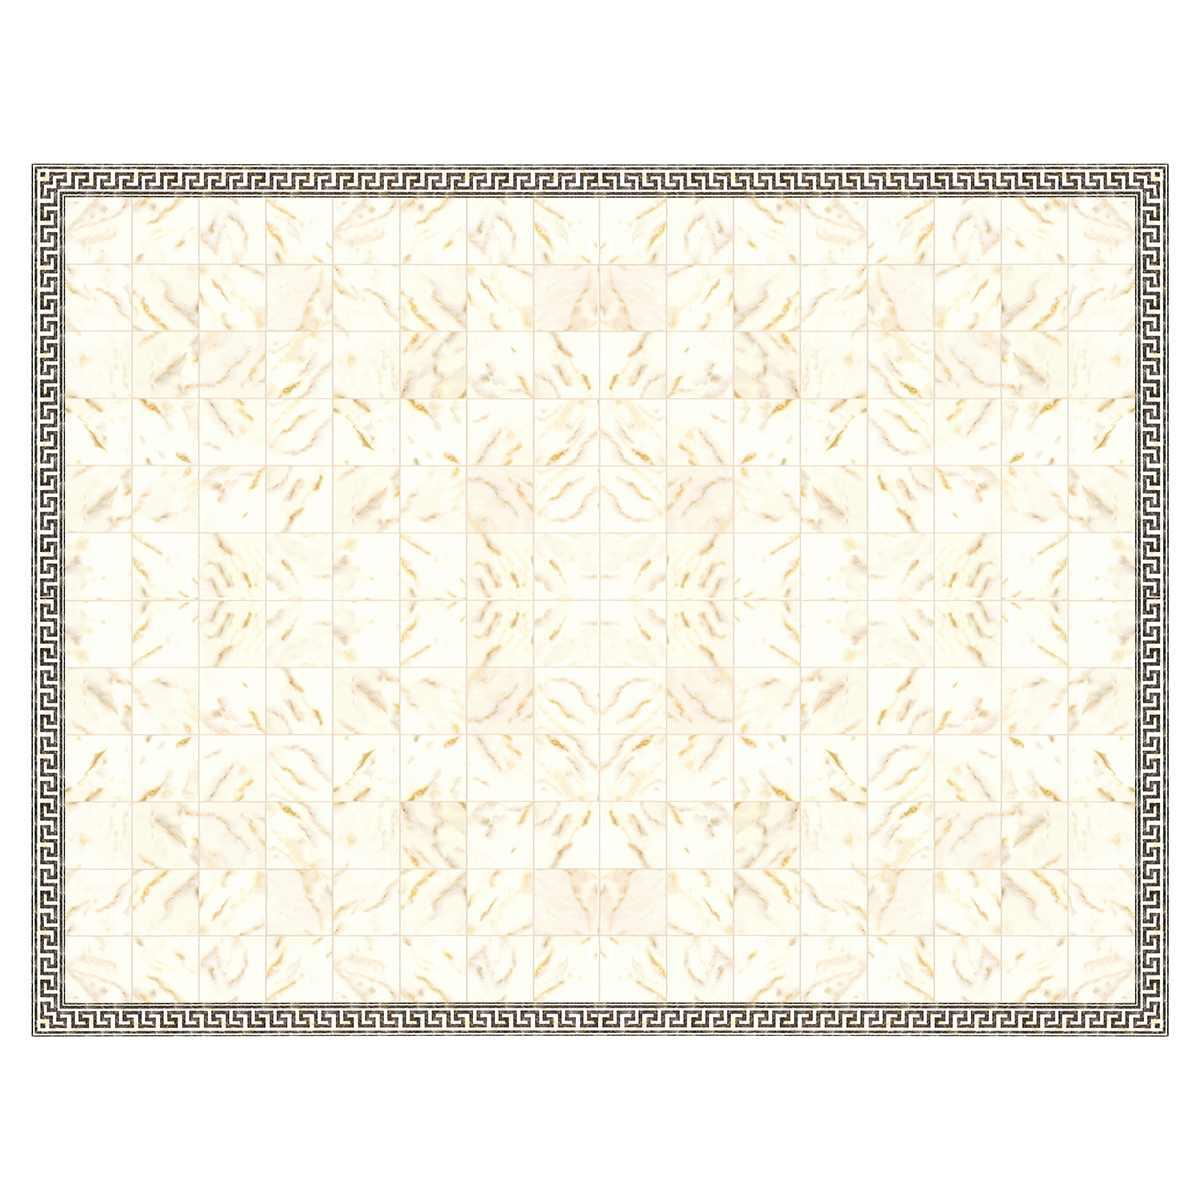 Marmorplatten-Folie, weiß, 425 x 325 mm